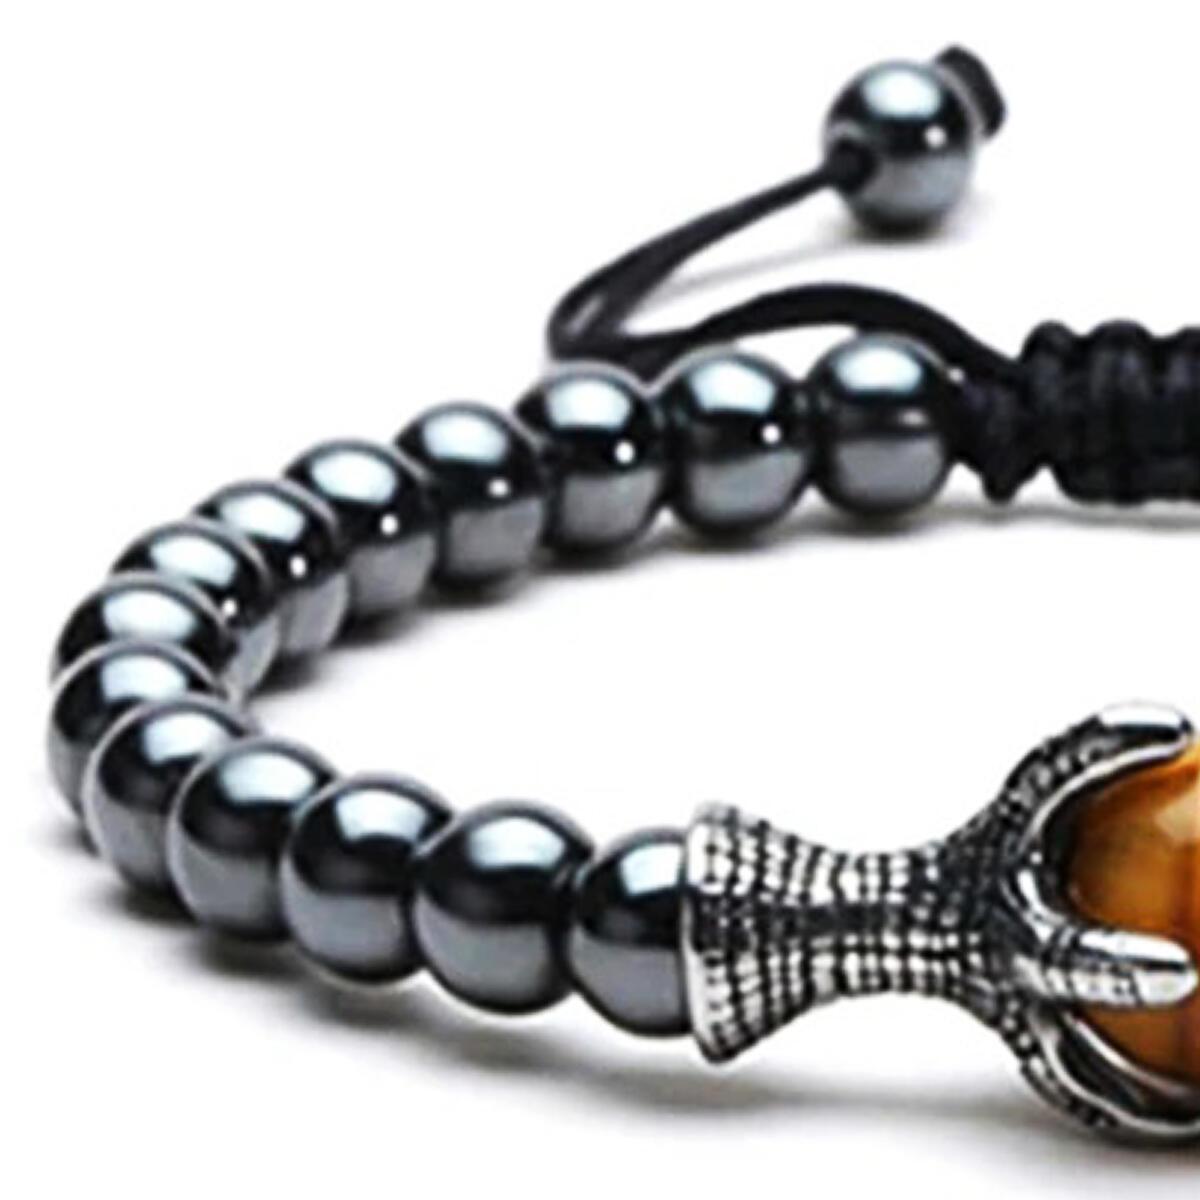 Stress Relief Hematite Charm Bracelet Feng Shui Wealth Chakra Stone Natural Energy Tiger Eye Healing Crystal Set Mens Beaded Bracelets Yoga Jewelry Shungite Ying Yang Gemstone